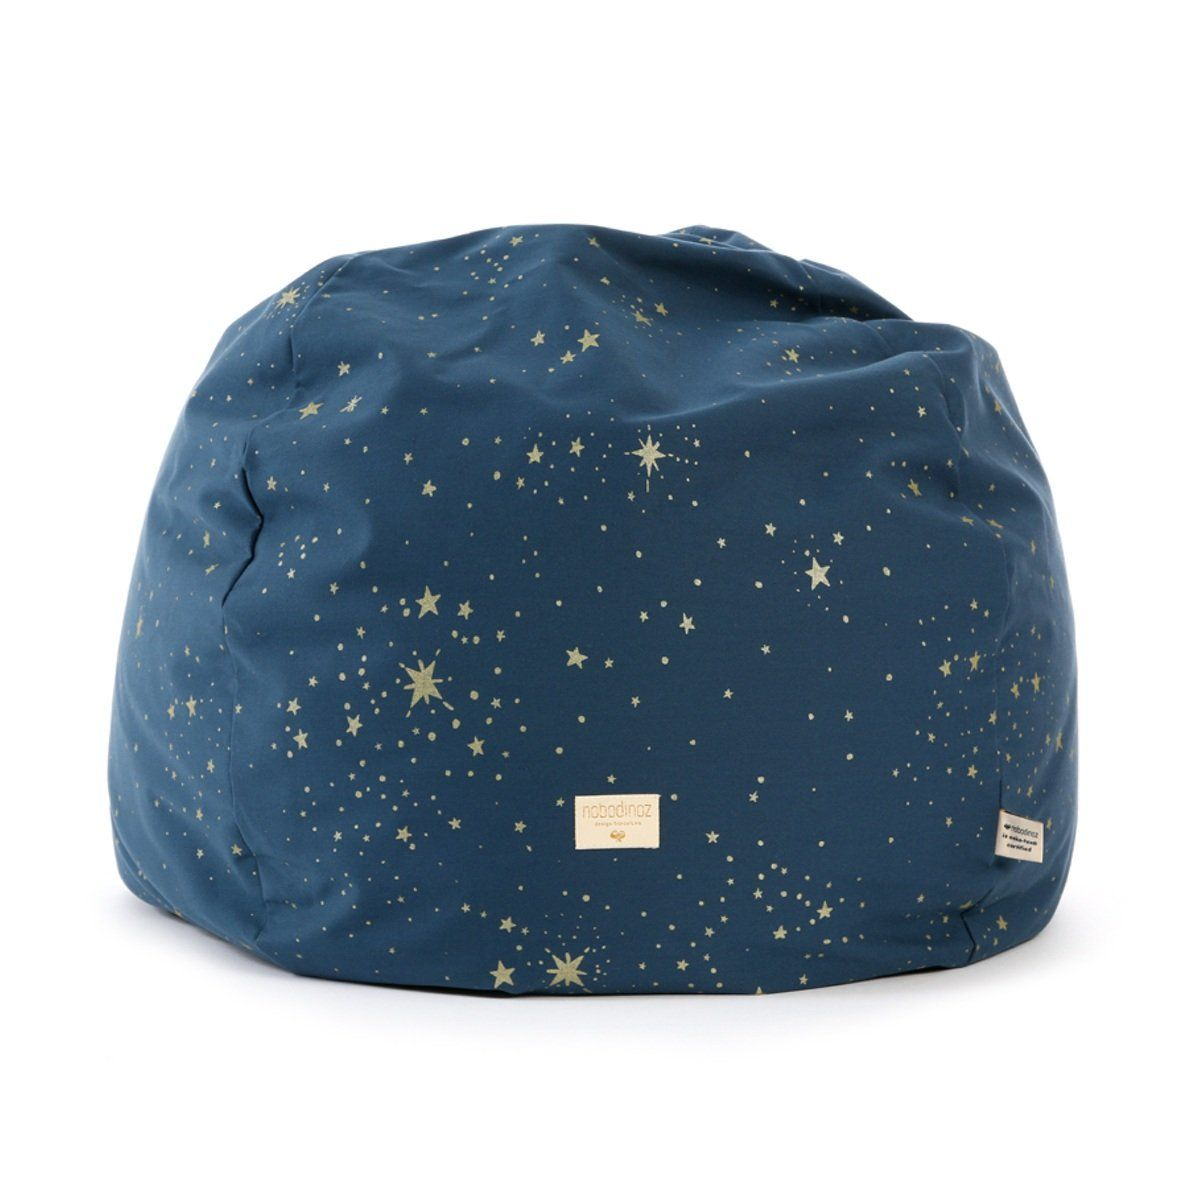 Nobodinoz KinderSitzsack Balloon dunkelblau mit Sternen